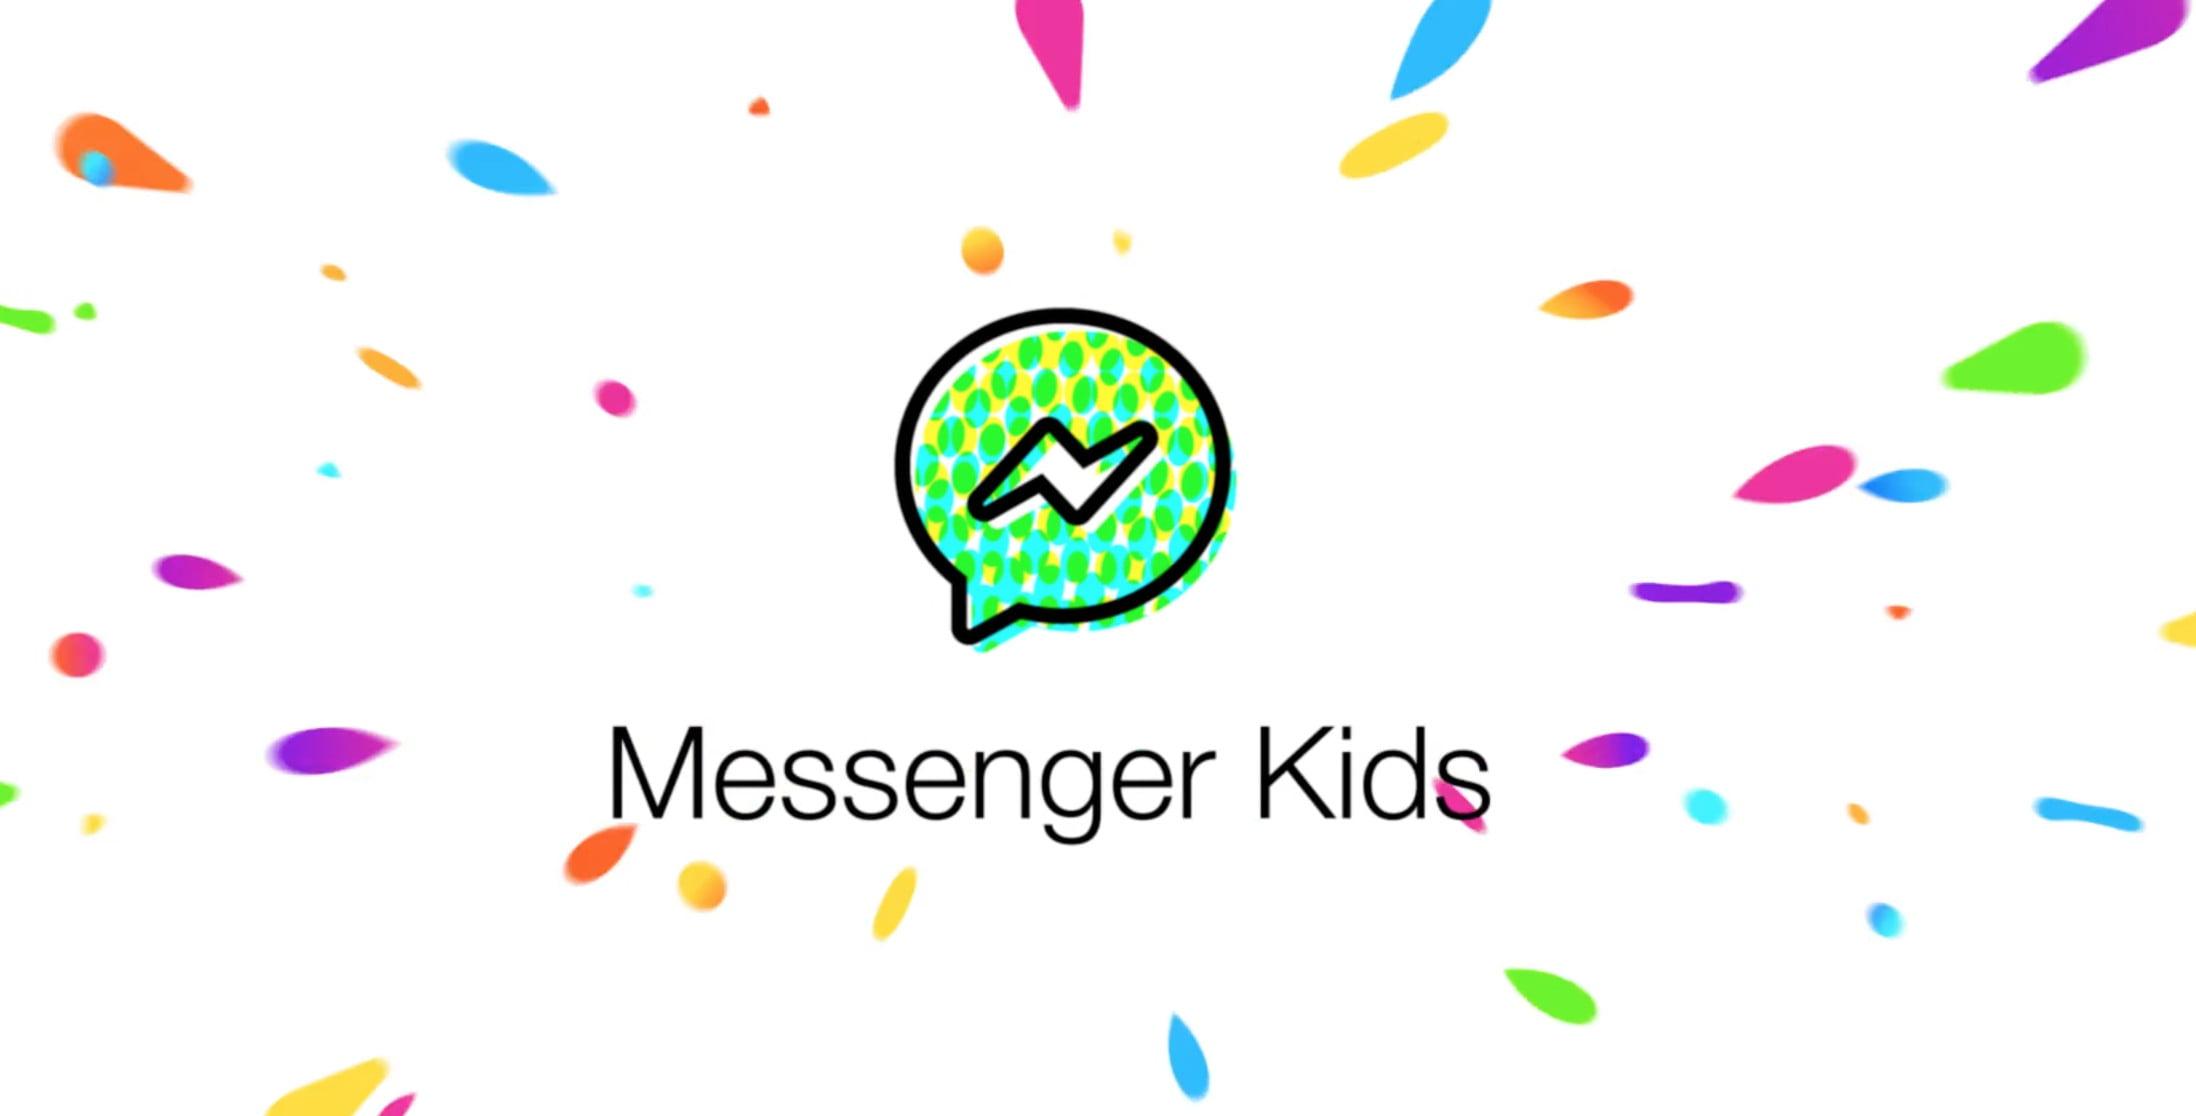 Facebook Launches Messenger Kids